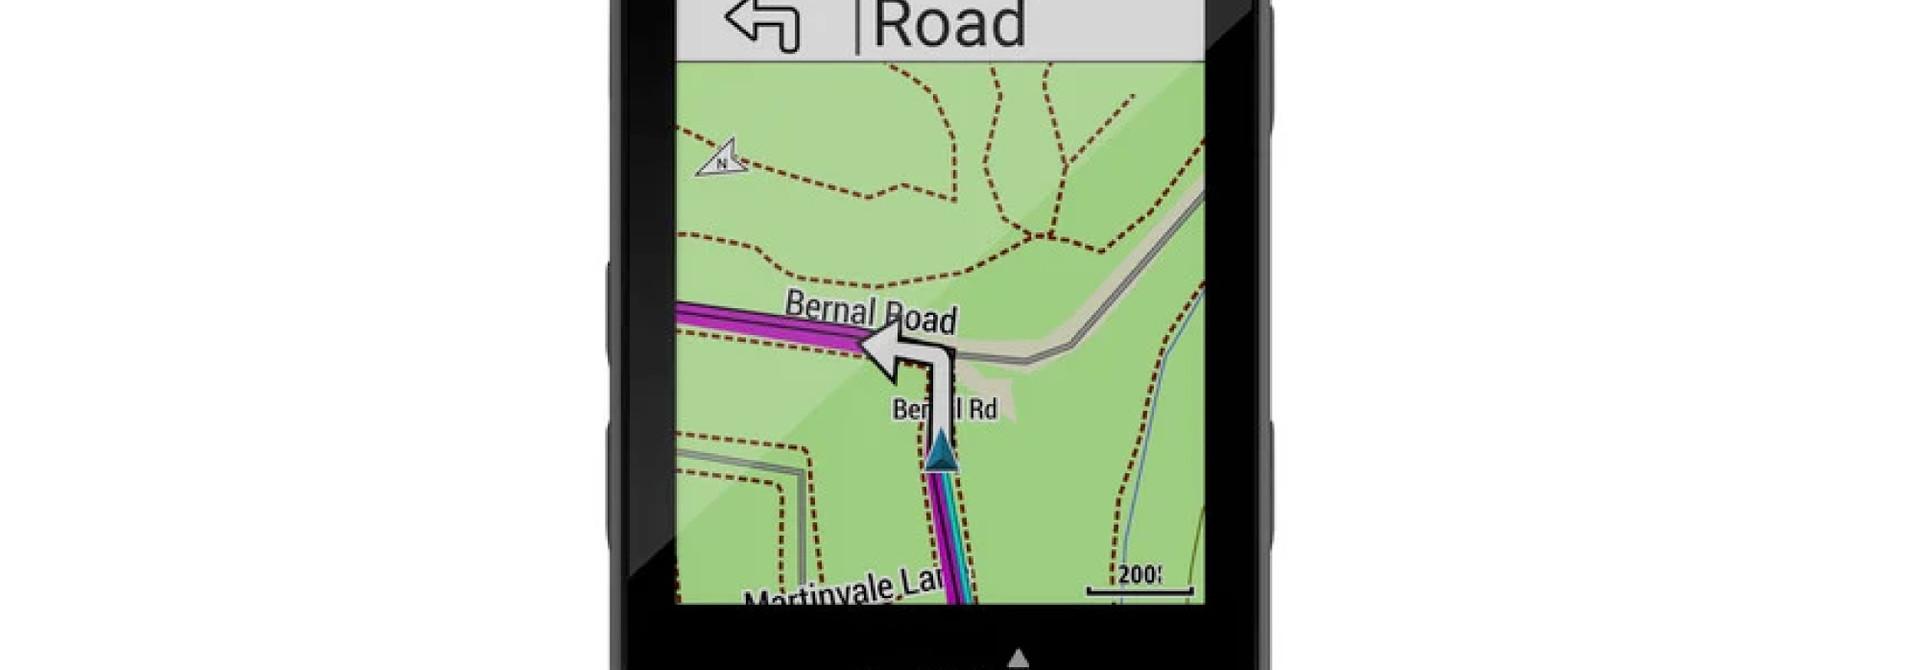 Edge 530 GPS Computer